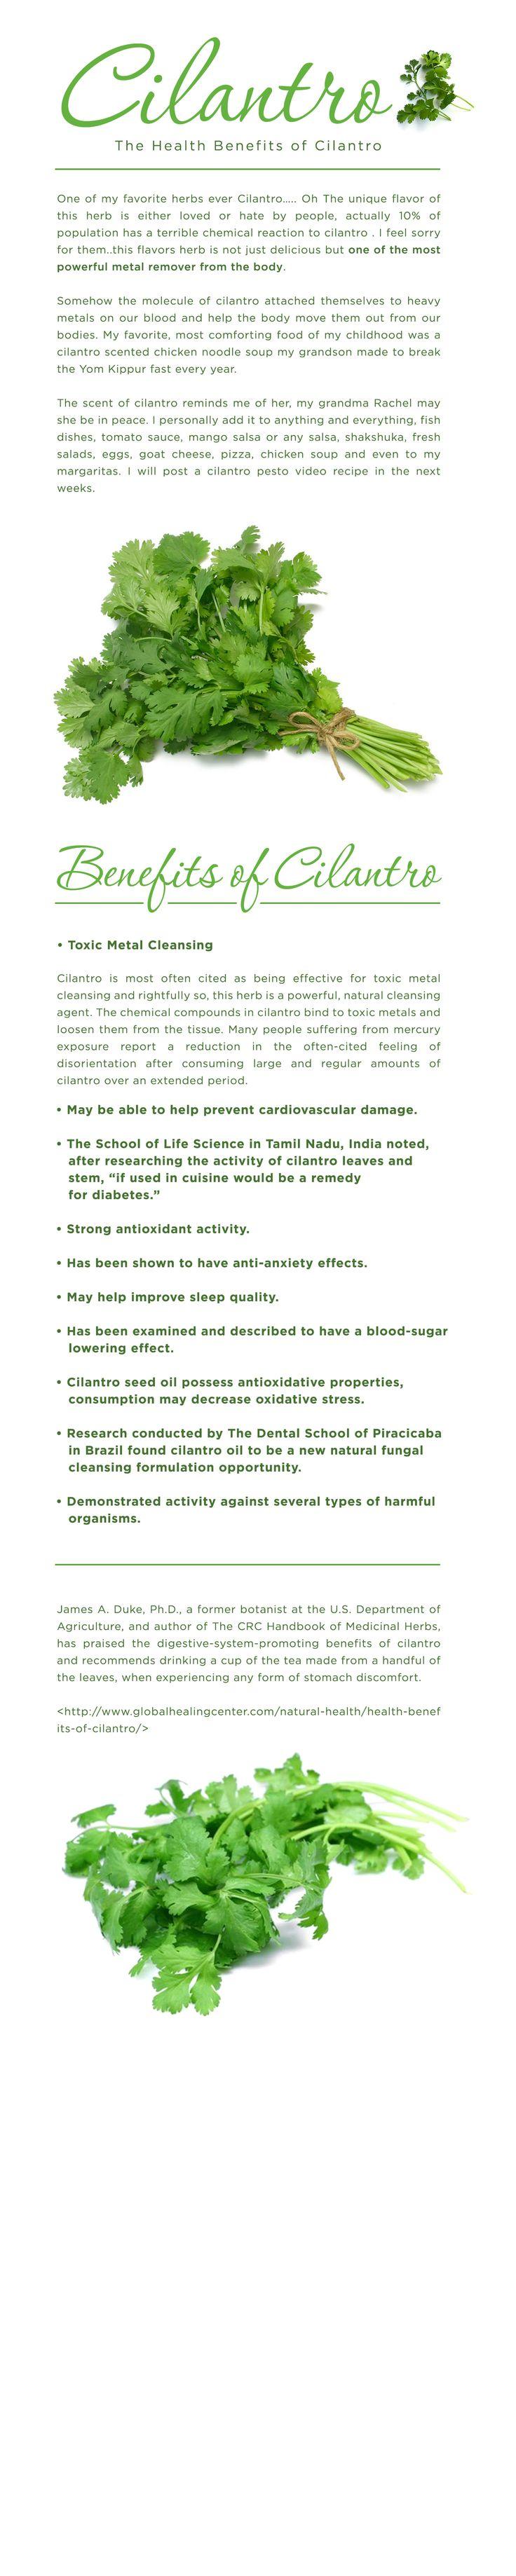 Health benefits of Cilantro — The Spice Detective